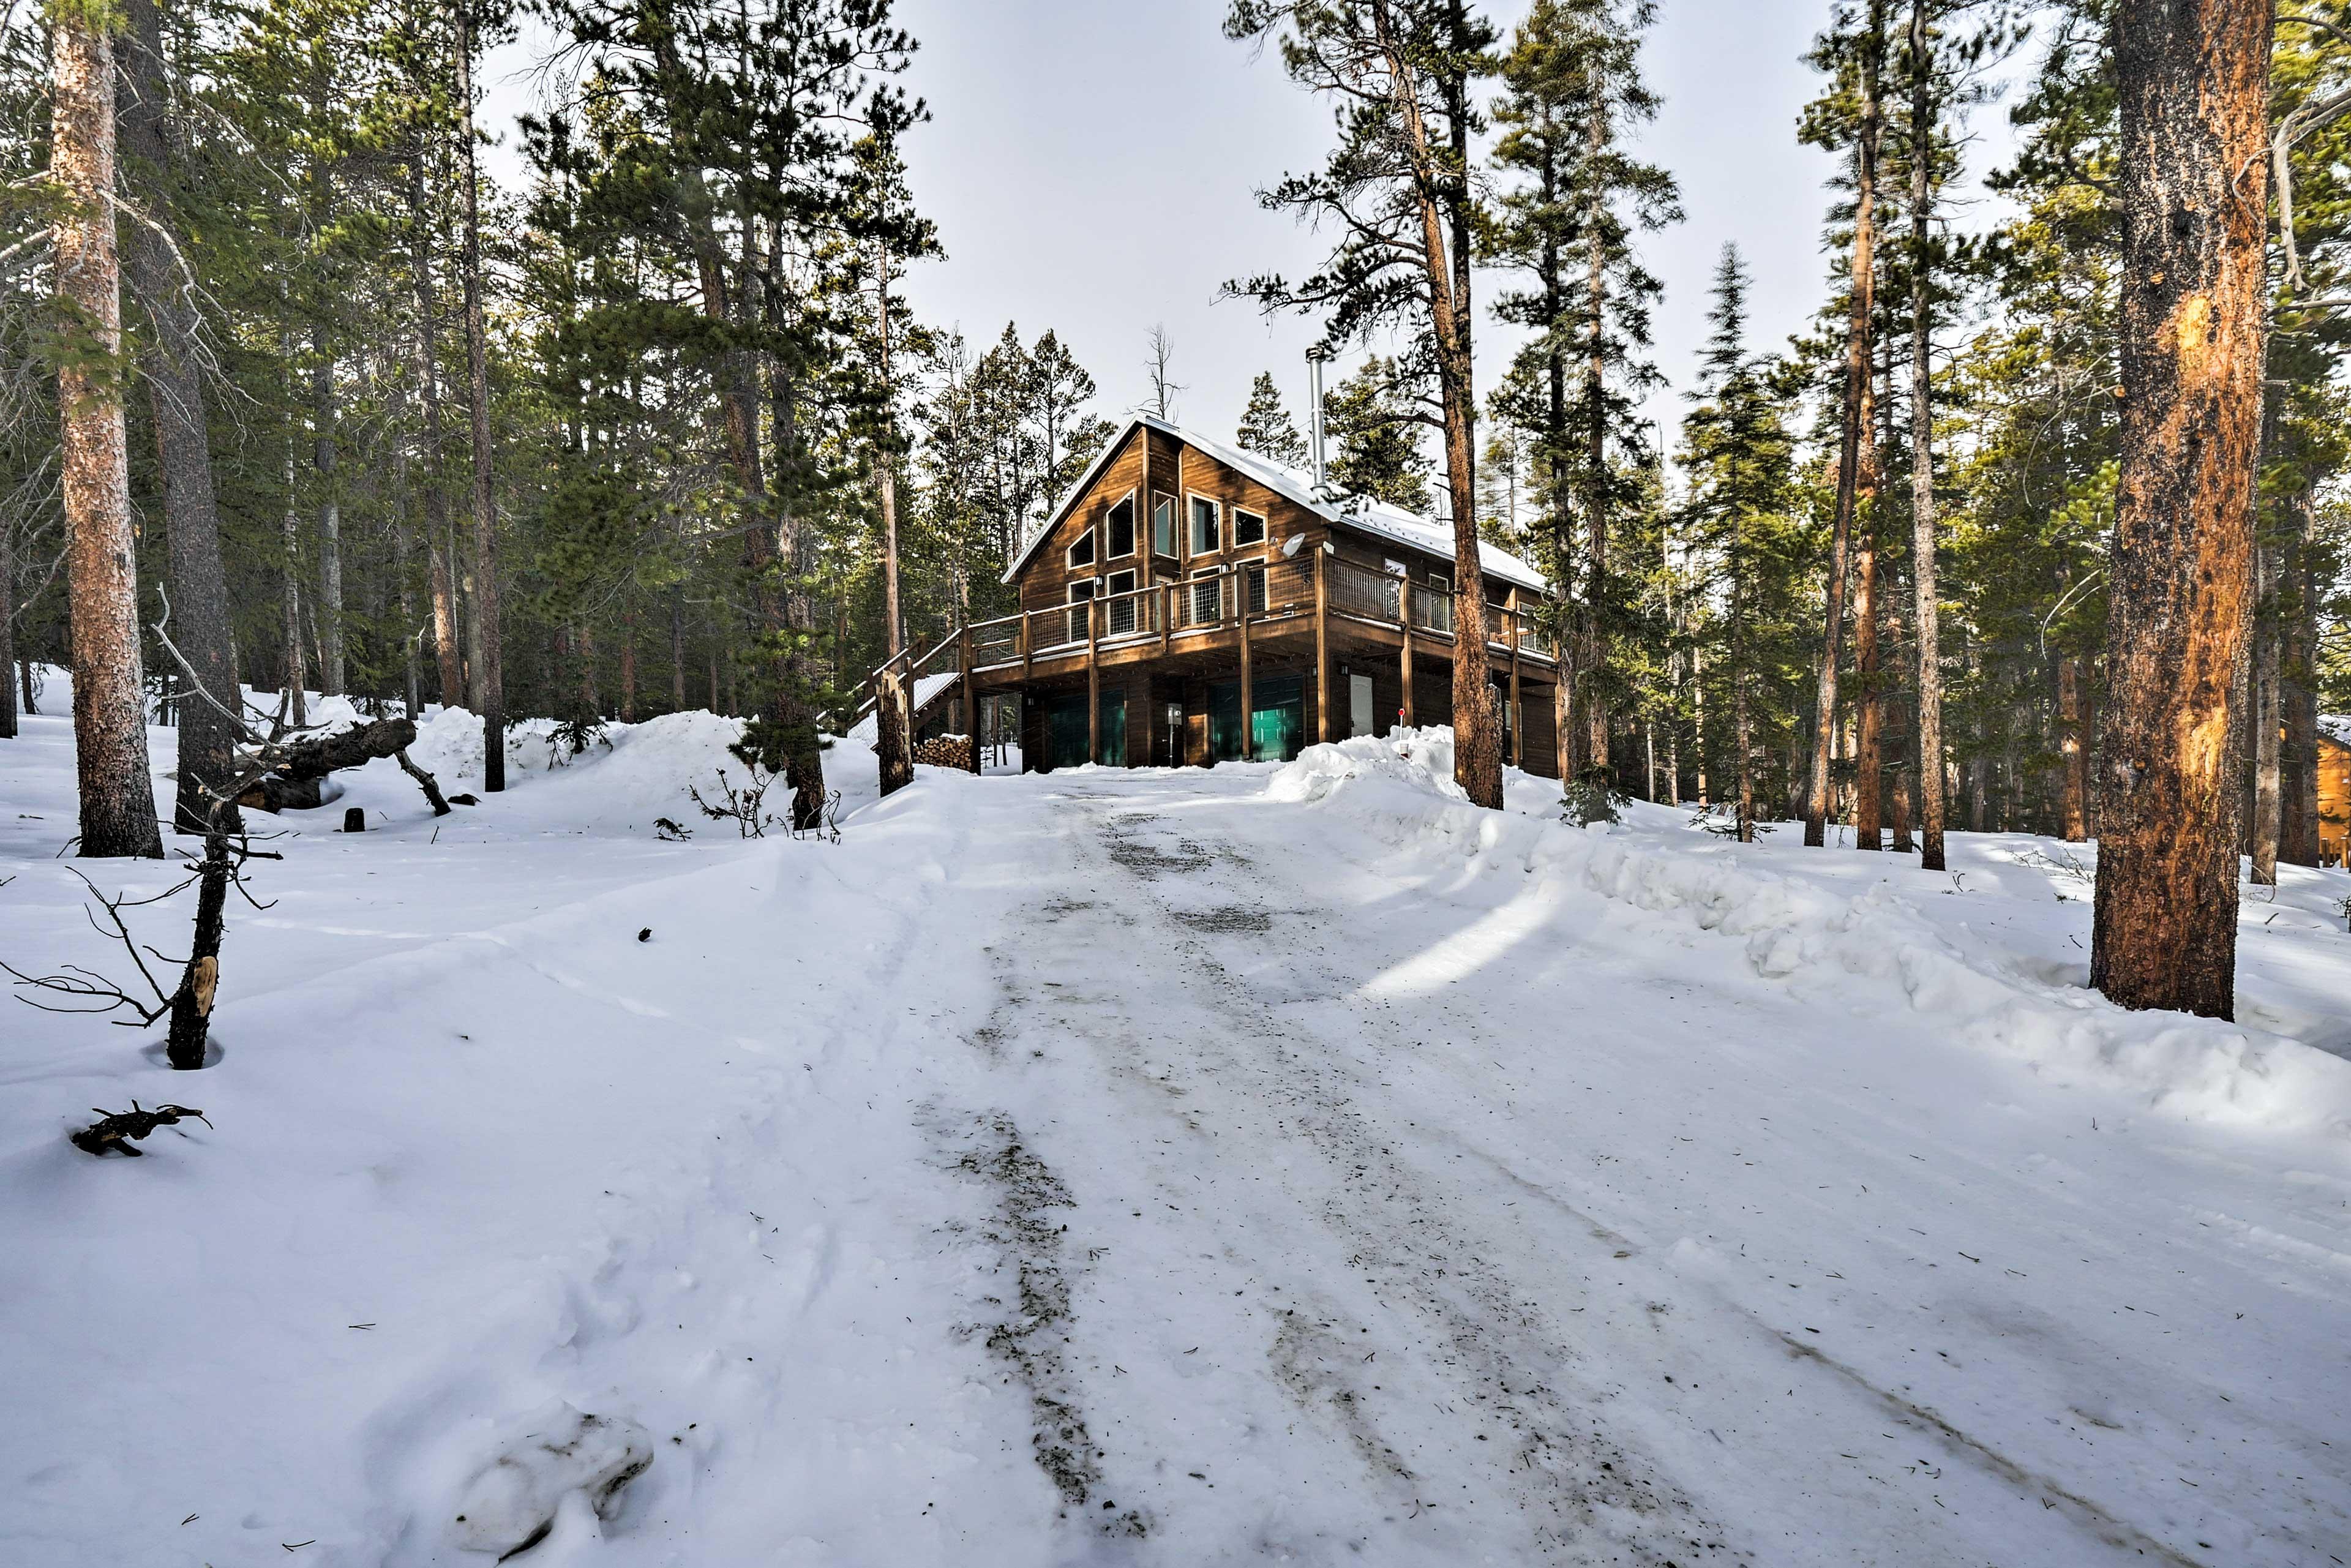 Your winter wonderland awaits!